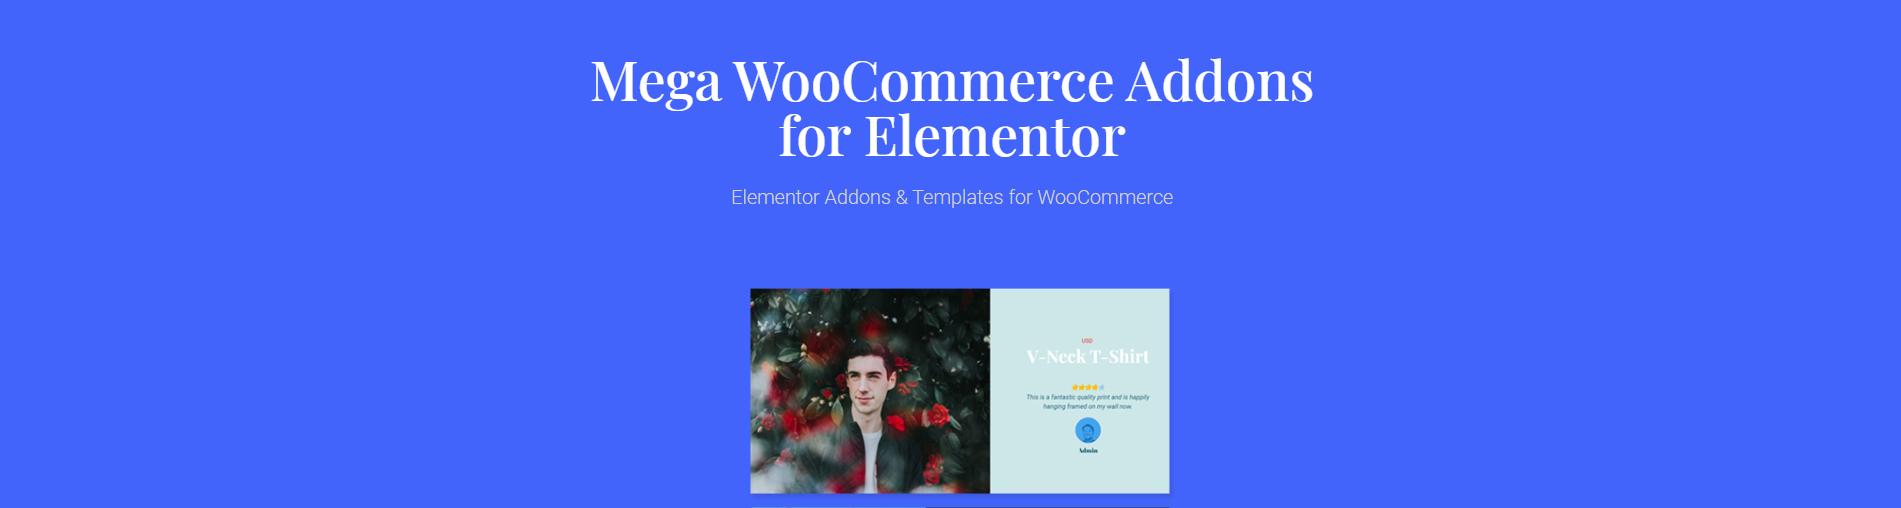 Mega WooCommerce Addons for Elementor